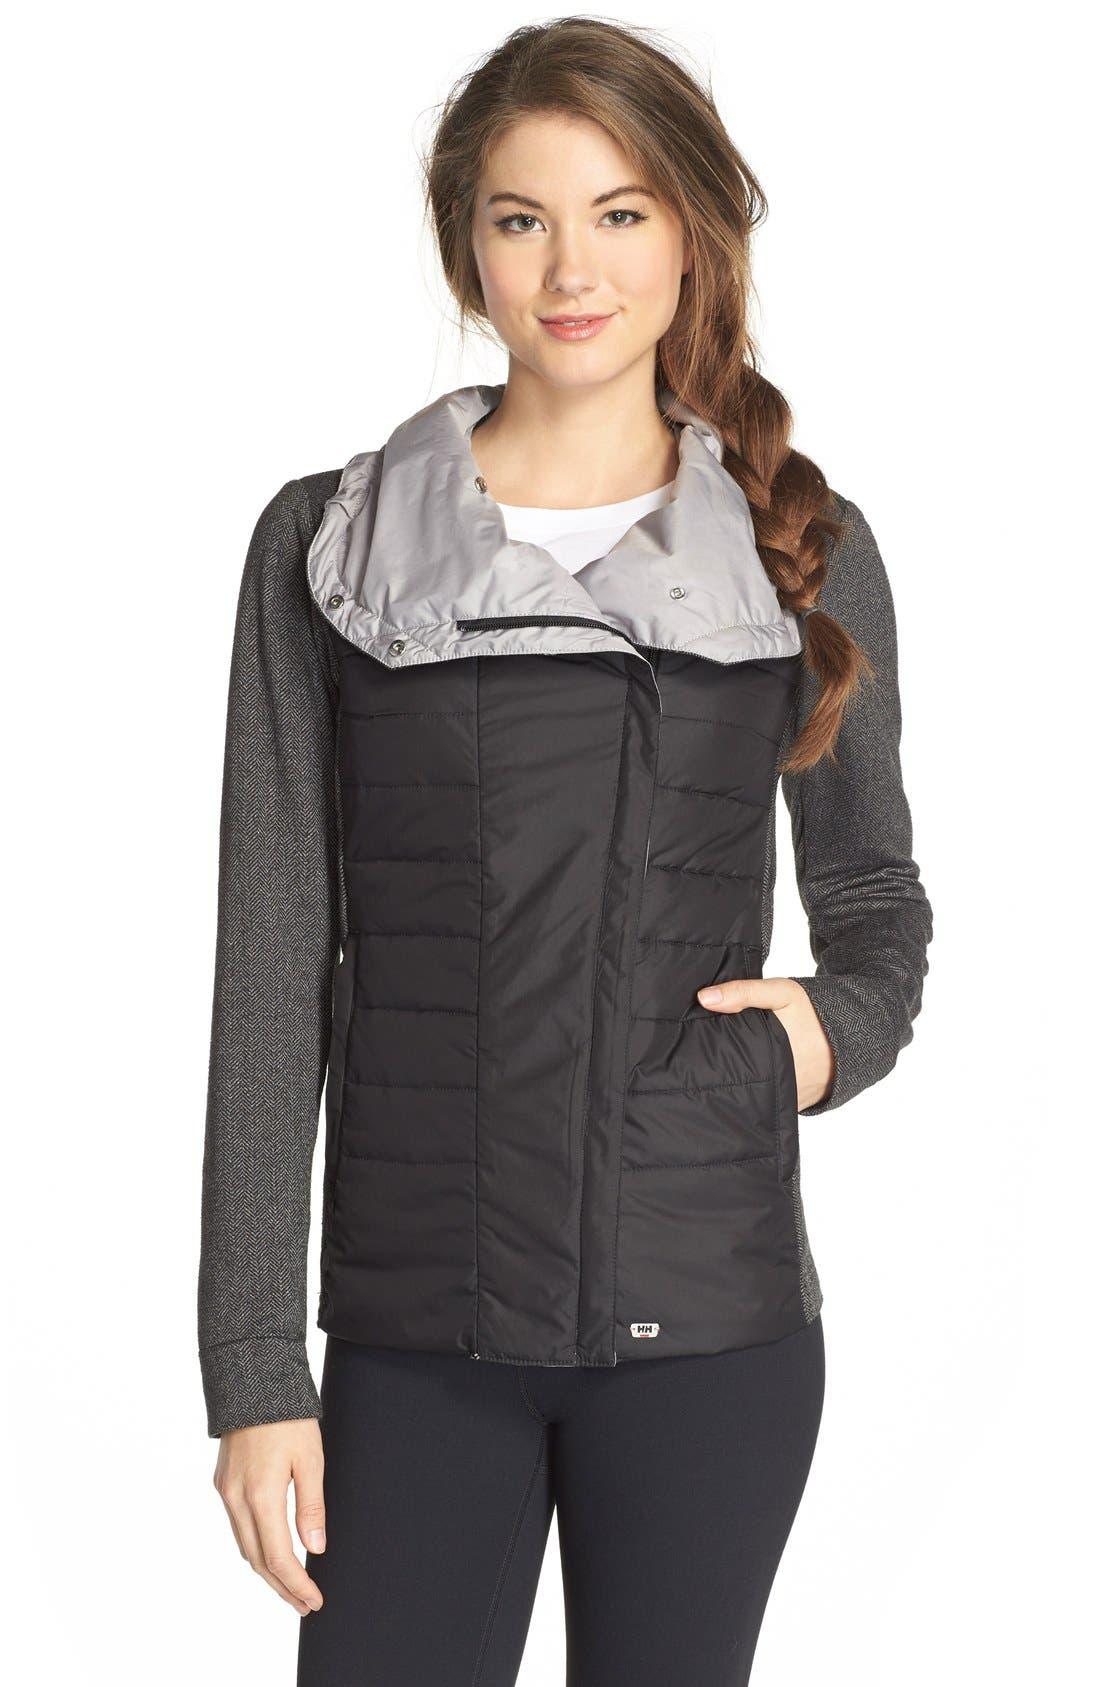 HellyHansen 'Astra' Jacket,                             Main thumbnail 1, color,                             BLACK